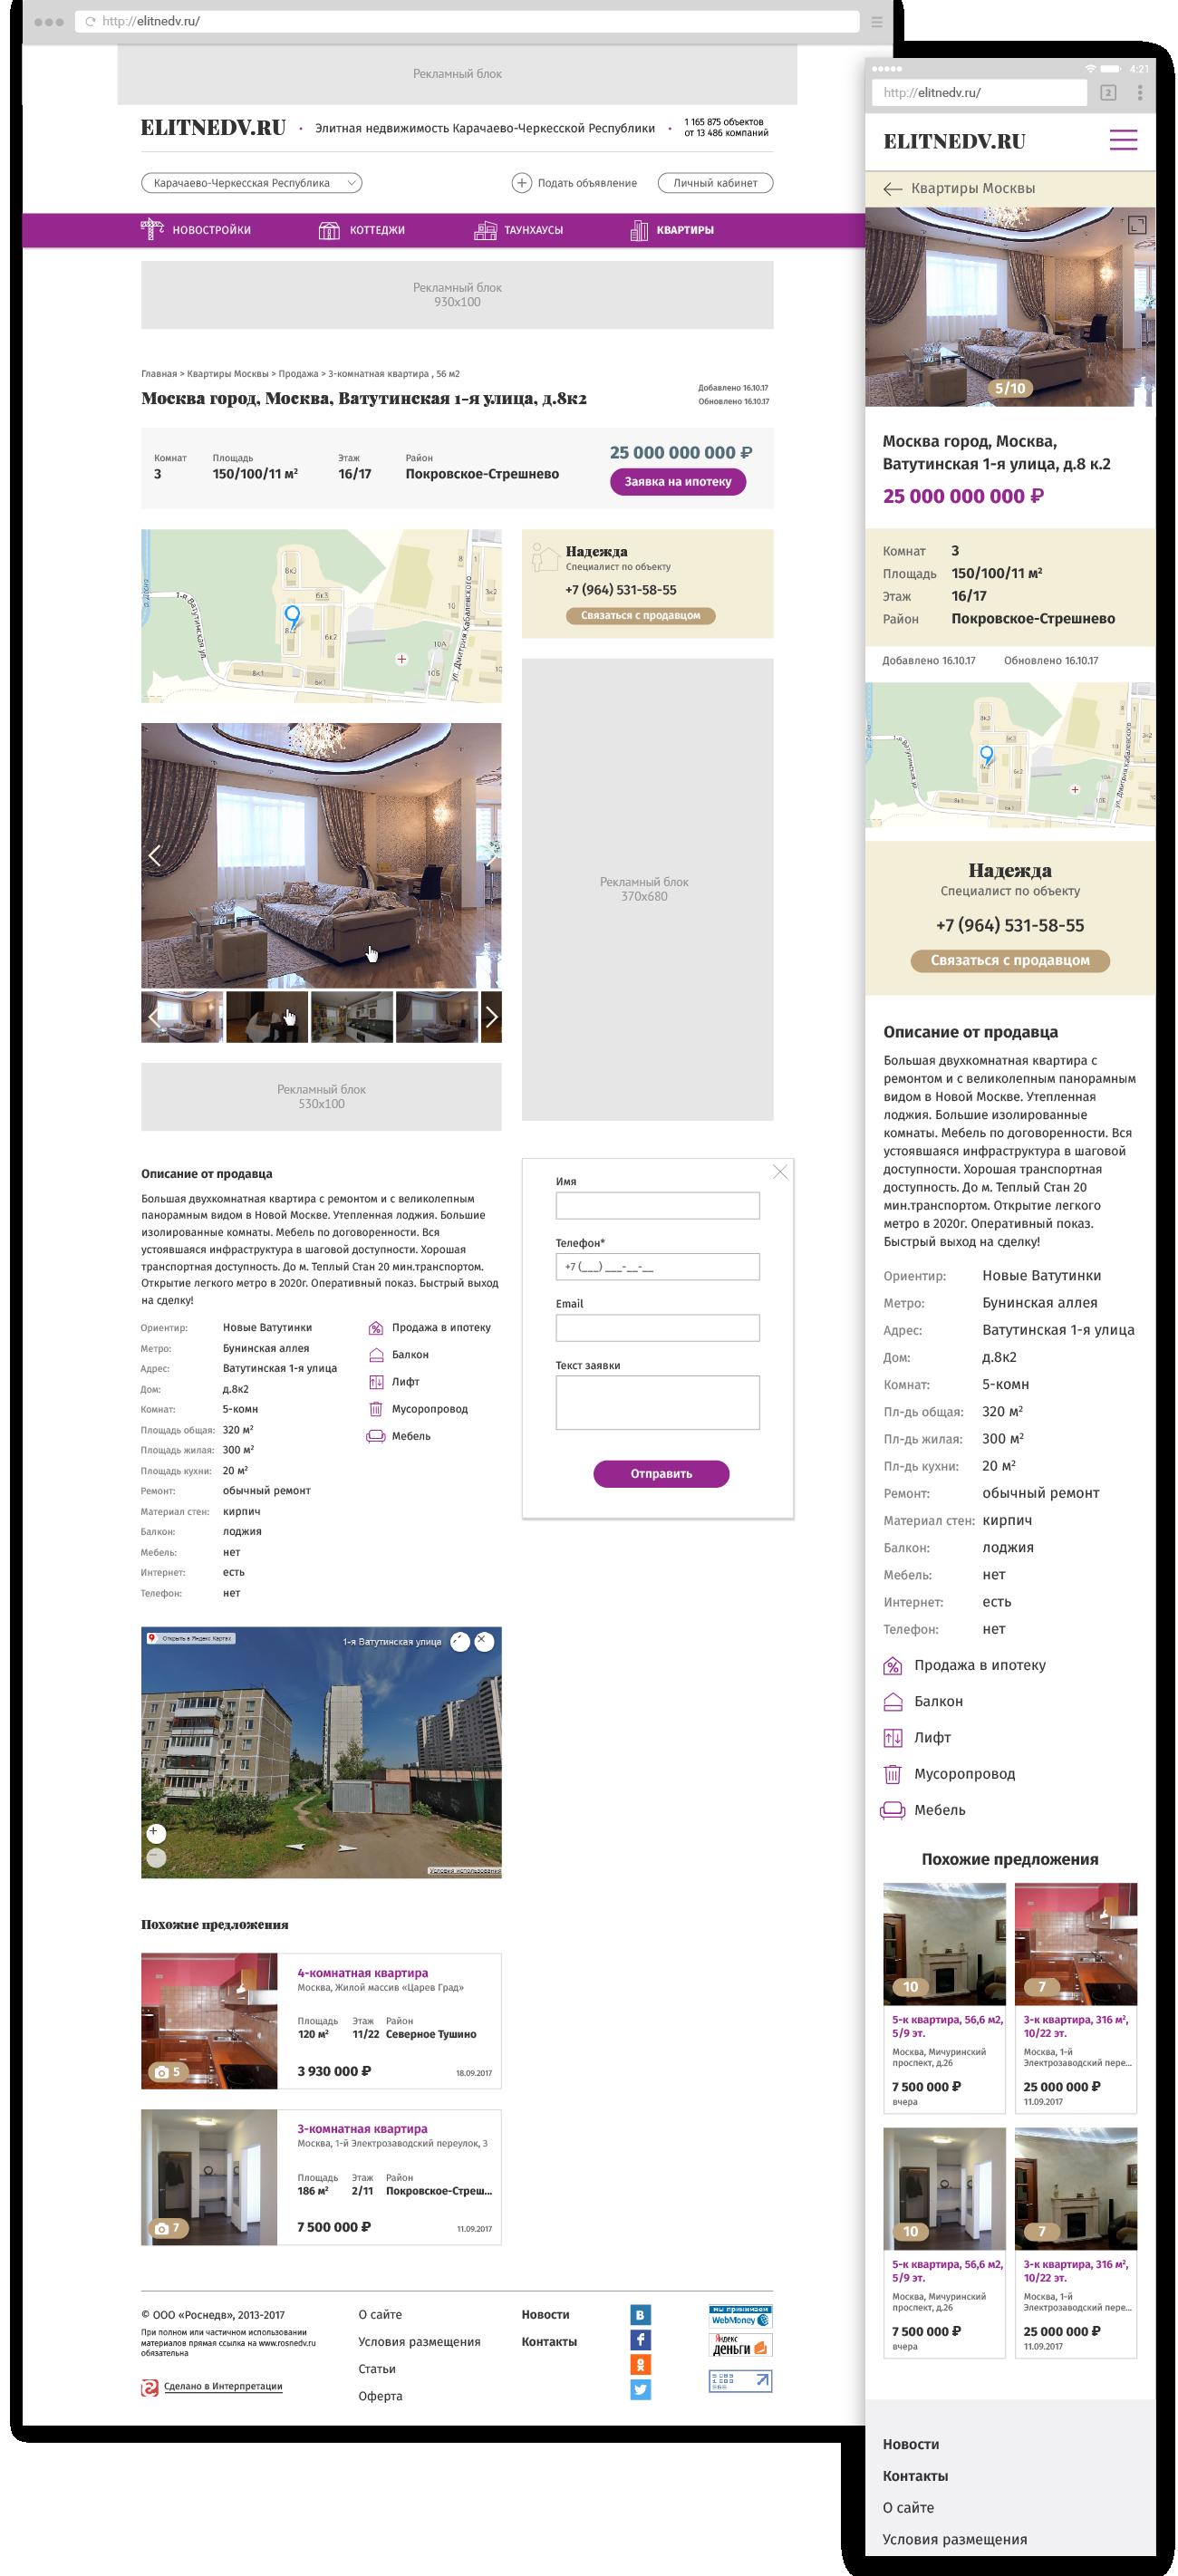 Страница с описанием объекта недвижимости.